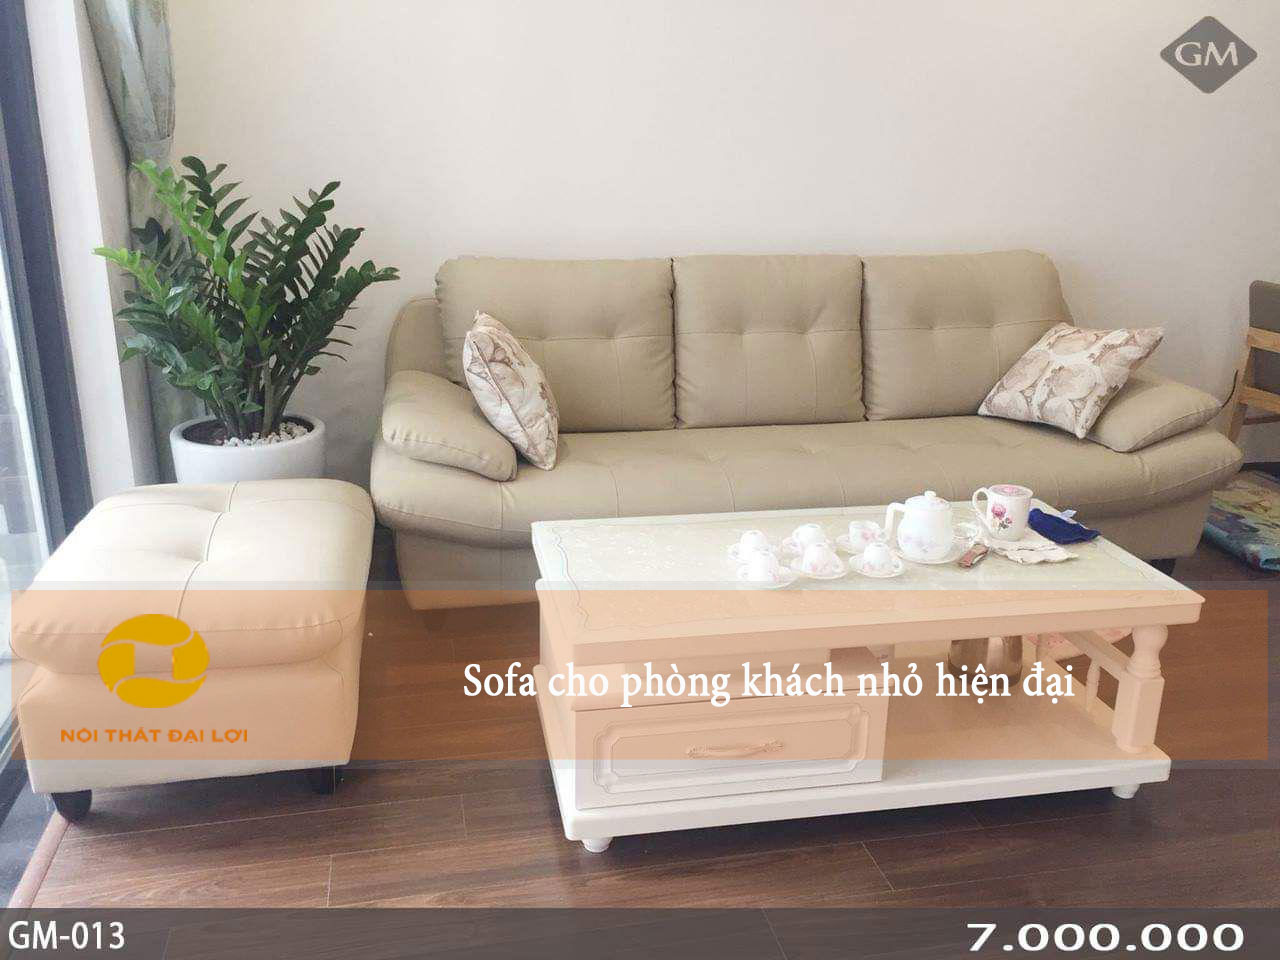 Mẫu 3 - Ghế sofa da cho phòng khách nhỏ